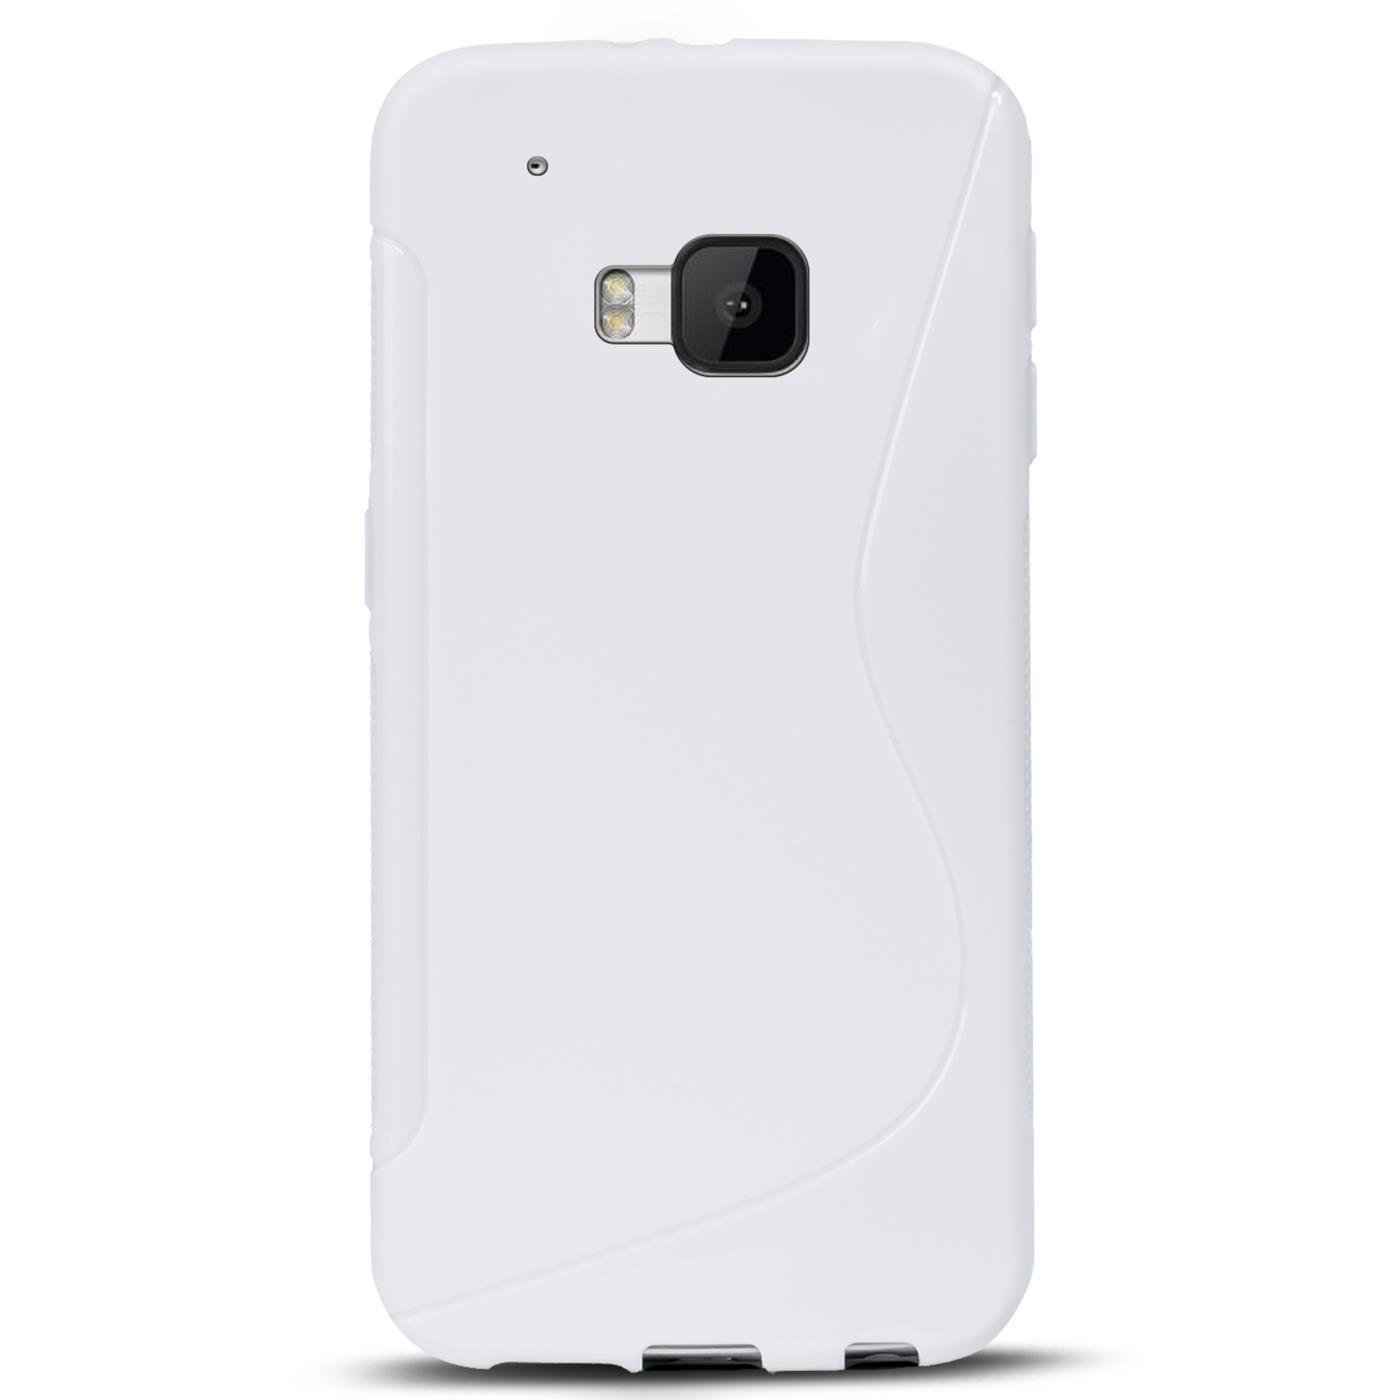 HTC-One-m9-Silikon-Gel-S-Line-Case-Cover-Ultra-Thin-Slim-Back-Bumper Indexbild 28